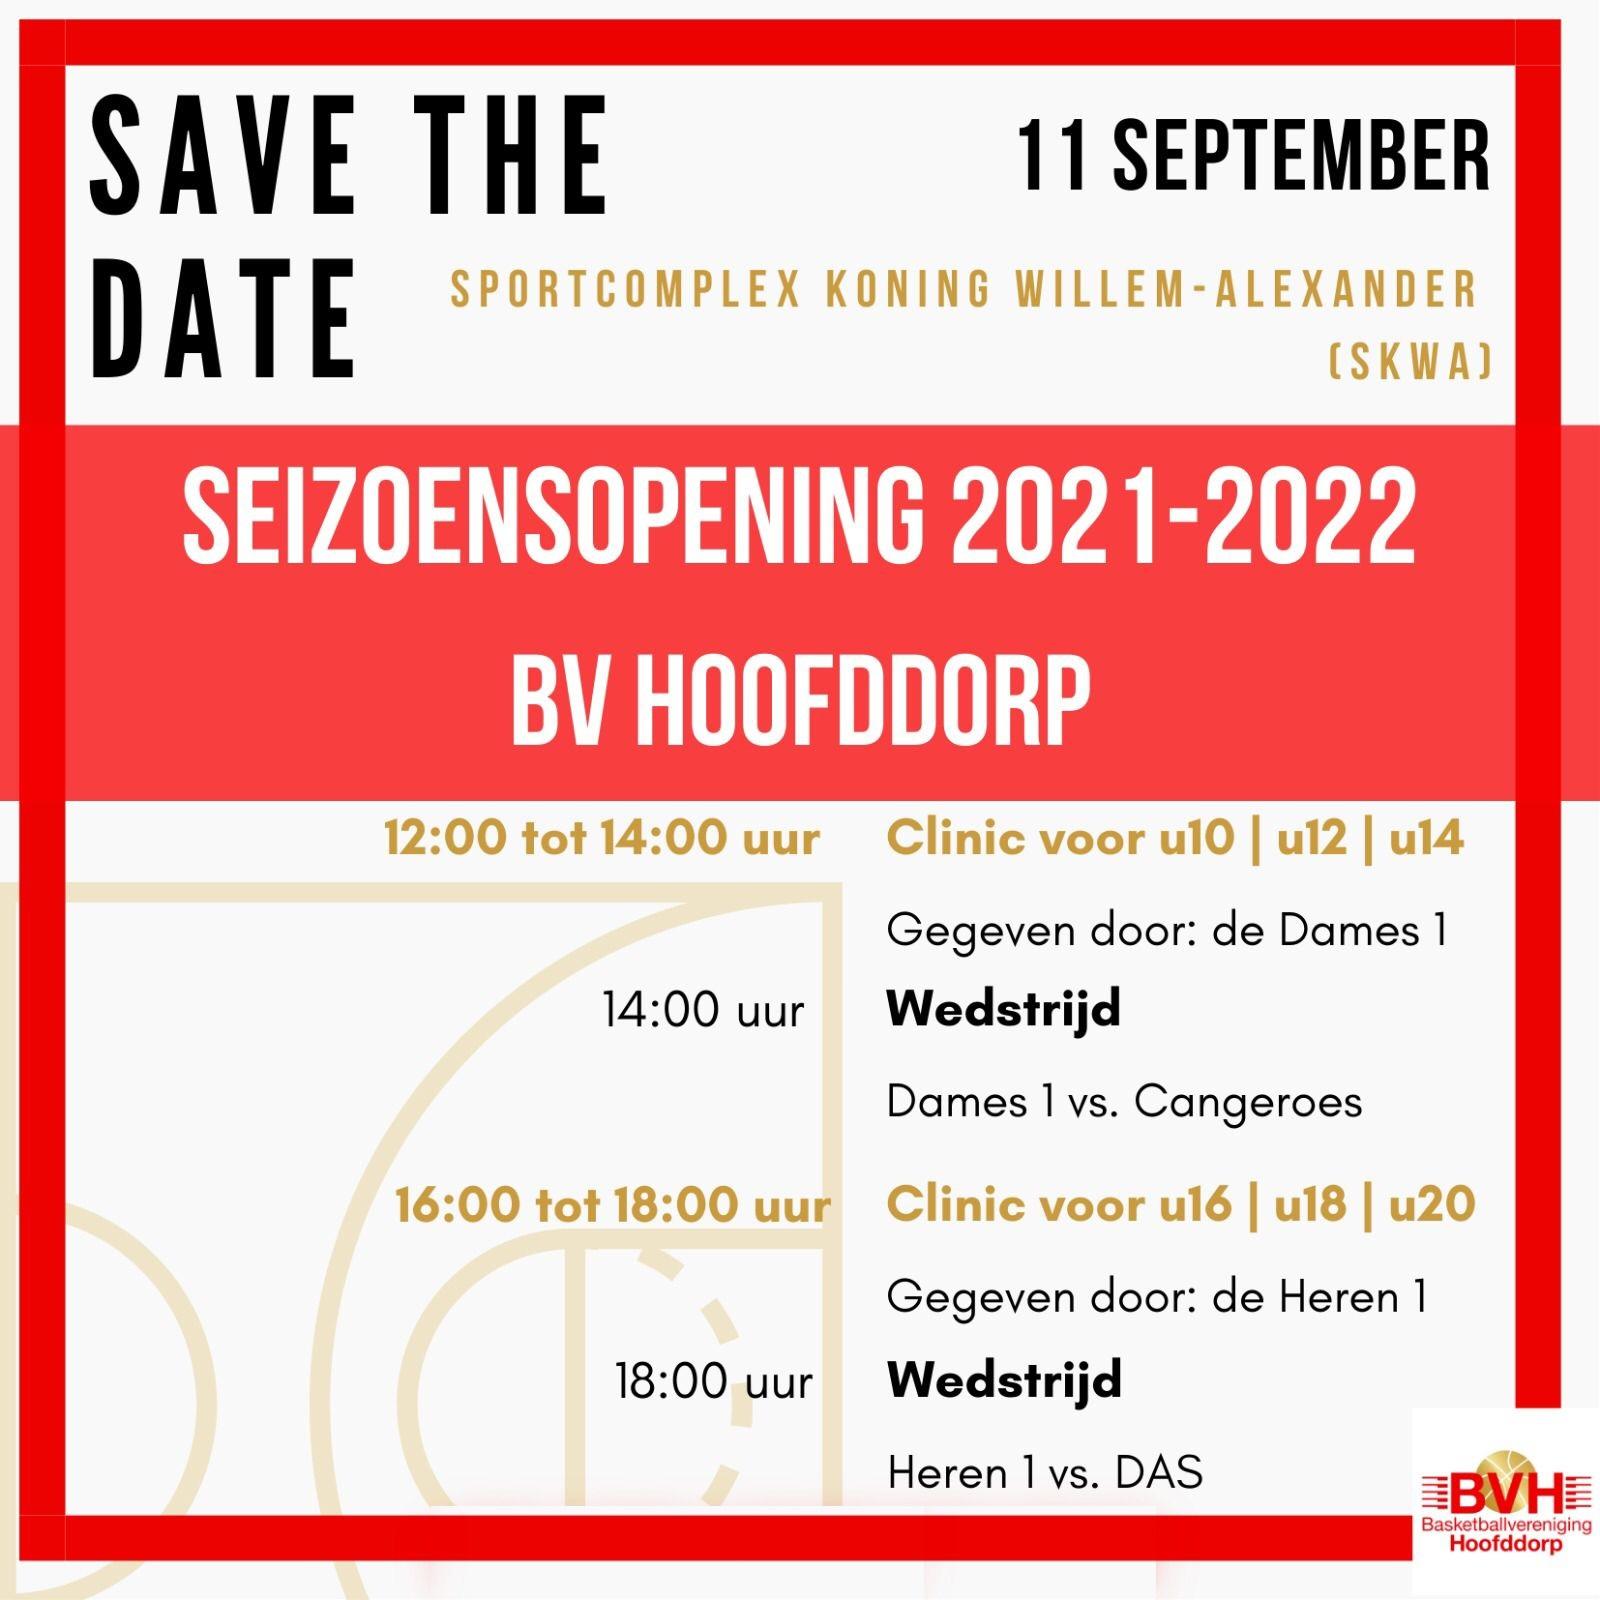 Seizoensopening 2021-2022 - Zaterdag 11 september